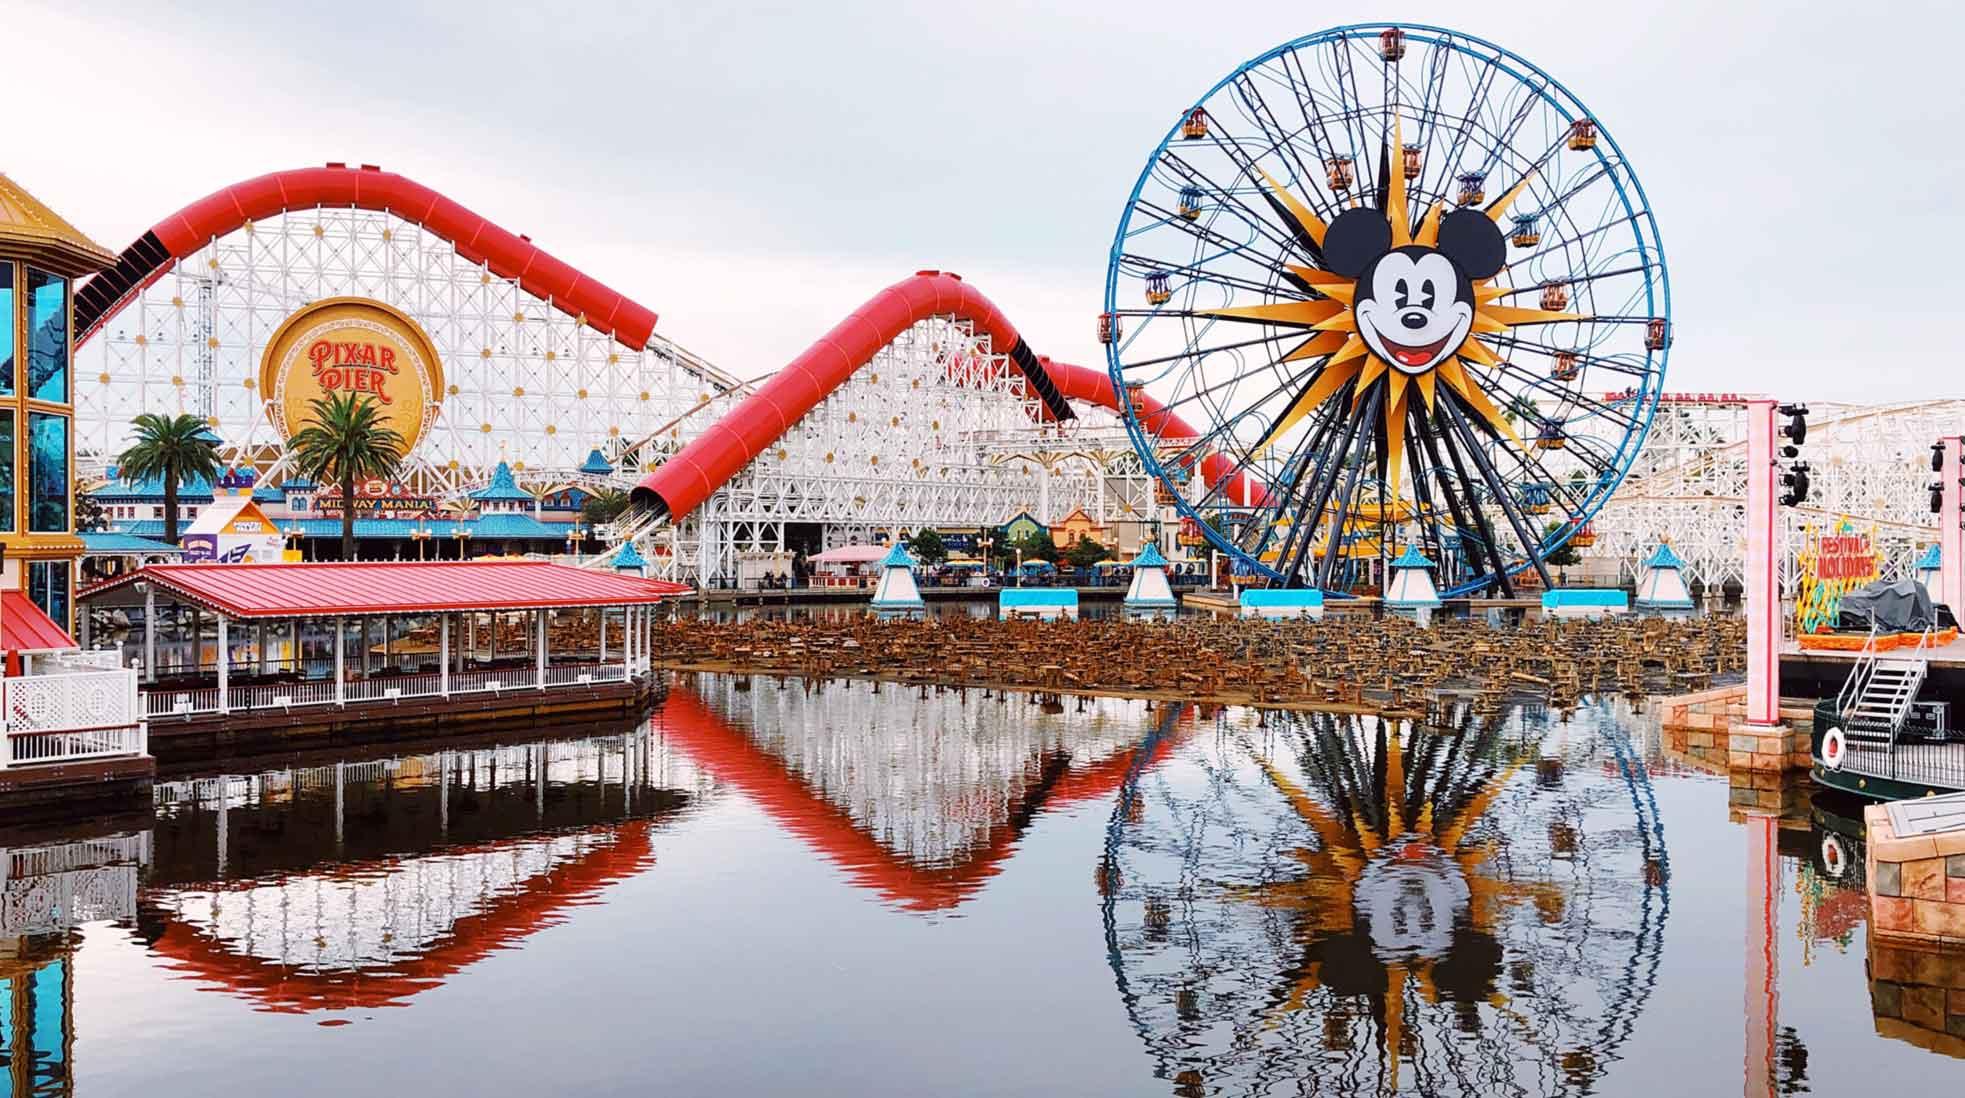 Rollercoaster and ferris wheel at Disneyland in Anaheim, California